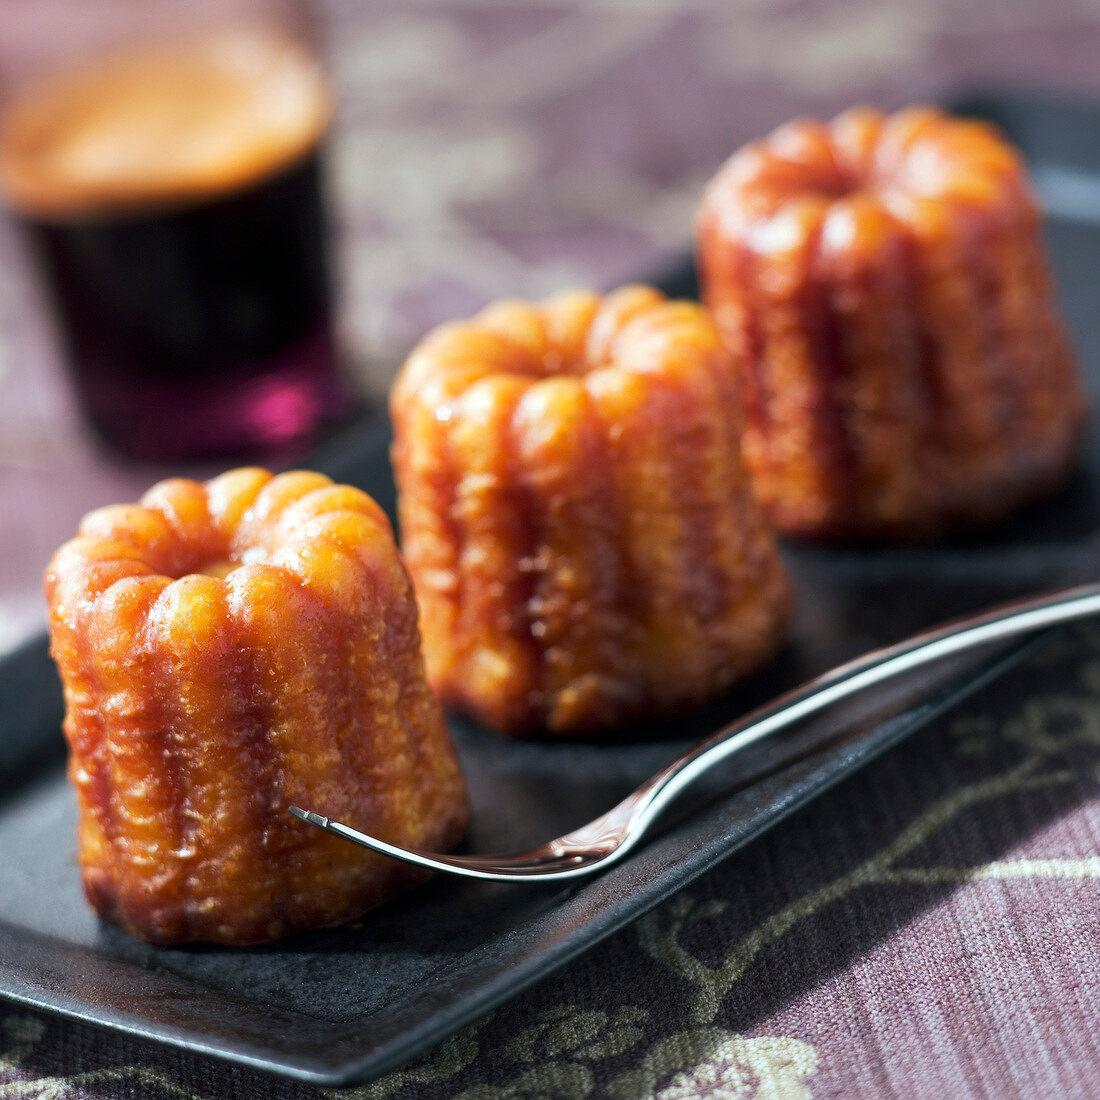 Cannelés cakes from Bordeaux